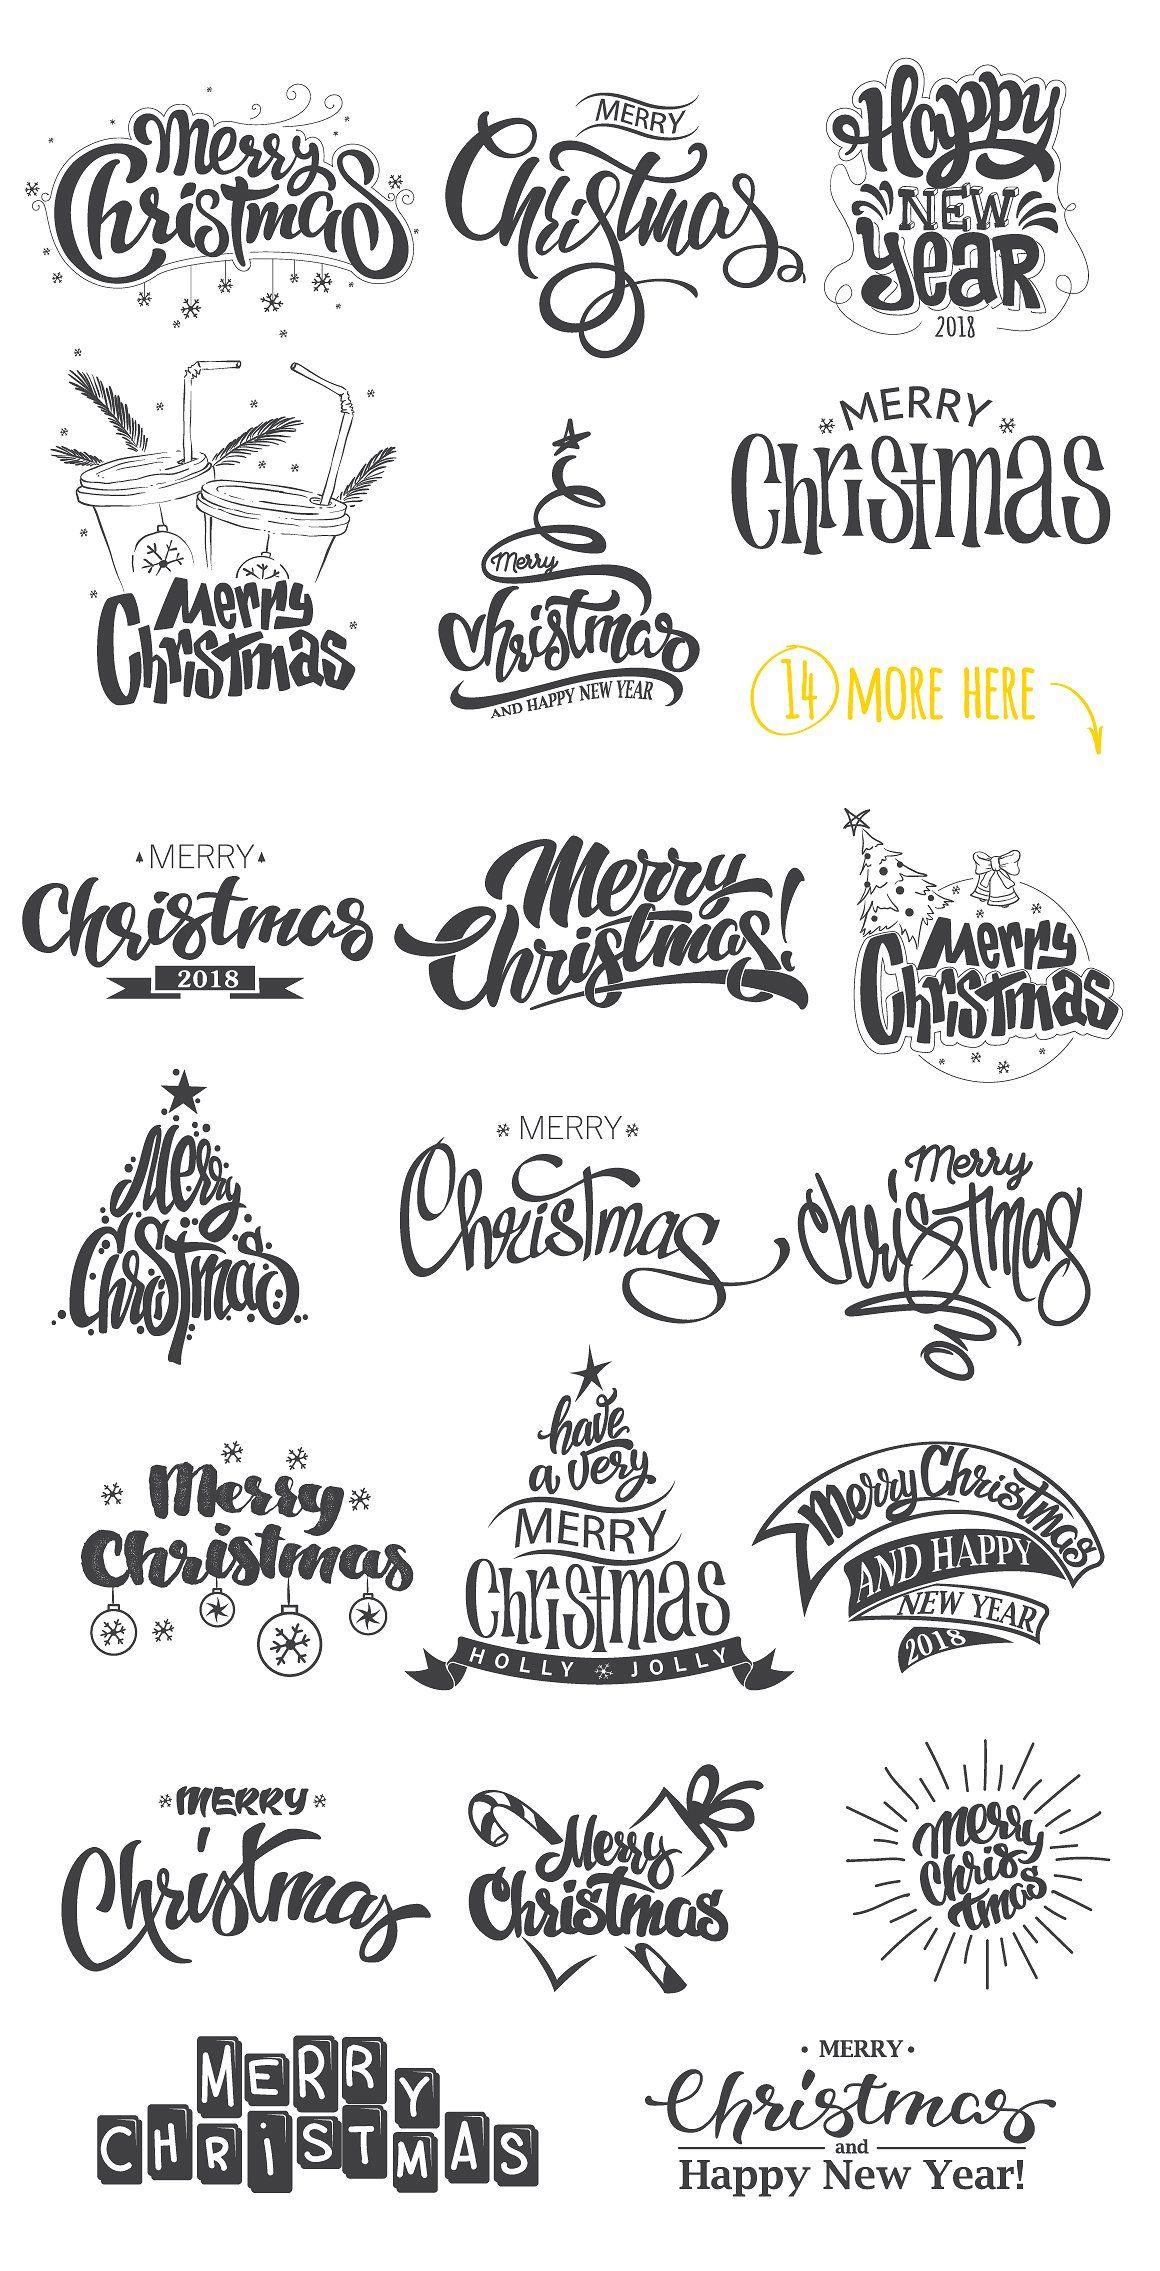 20 Christmas Overlays